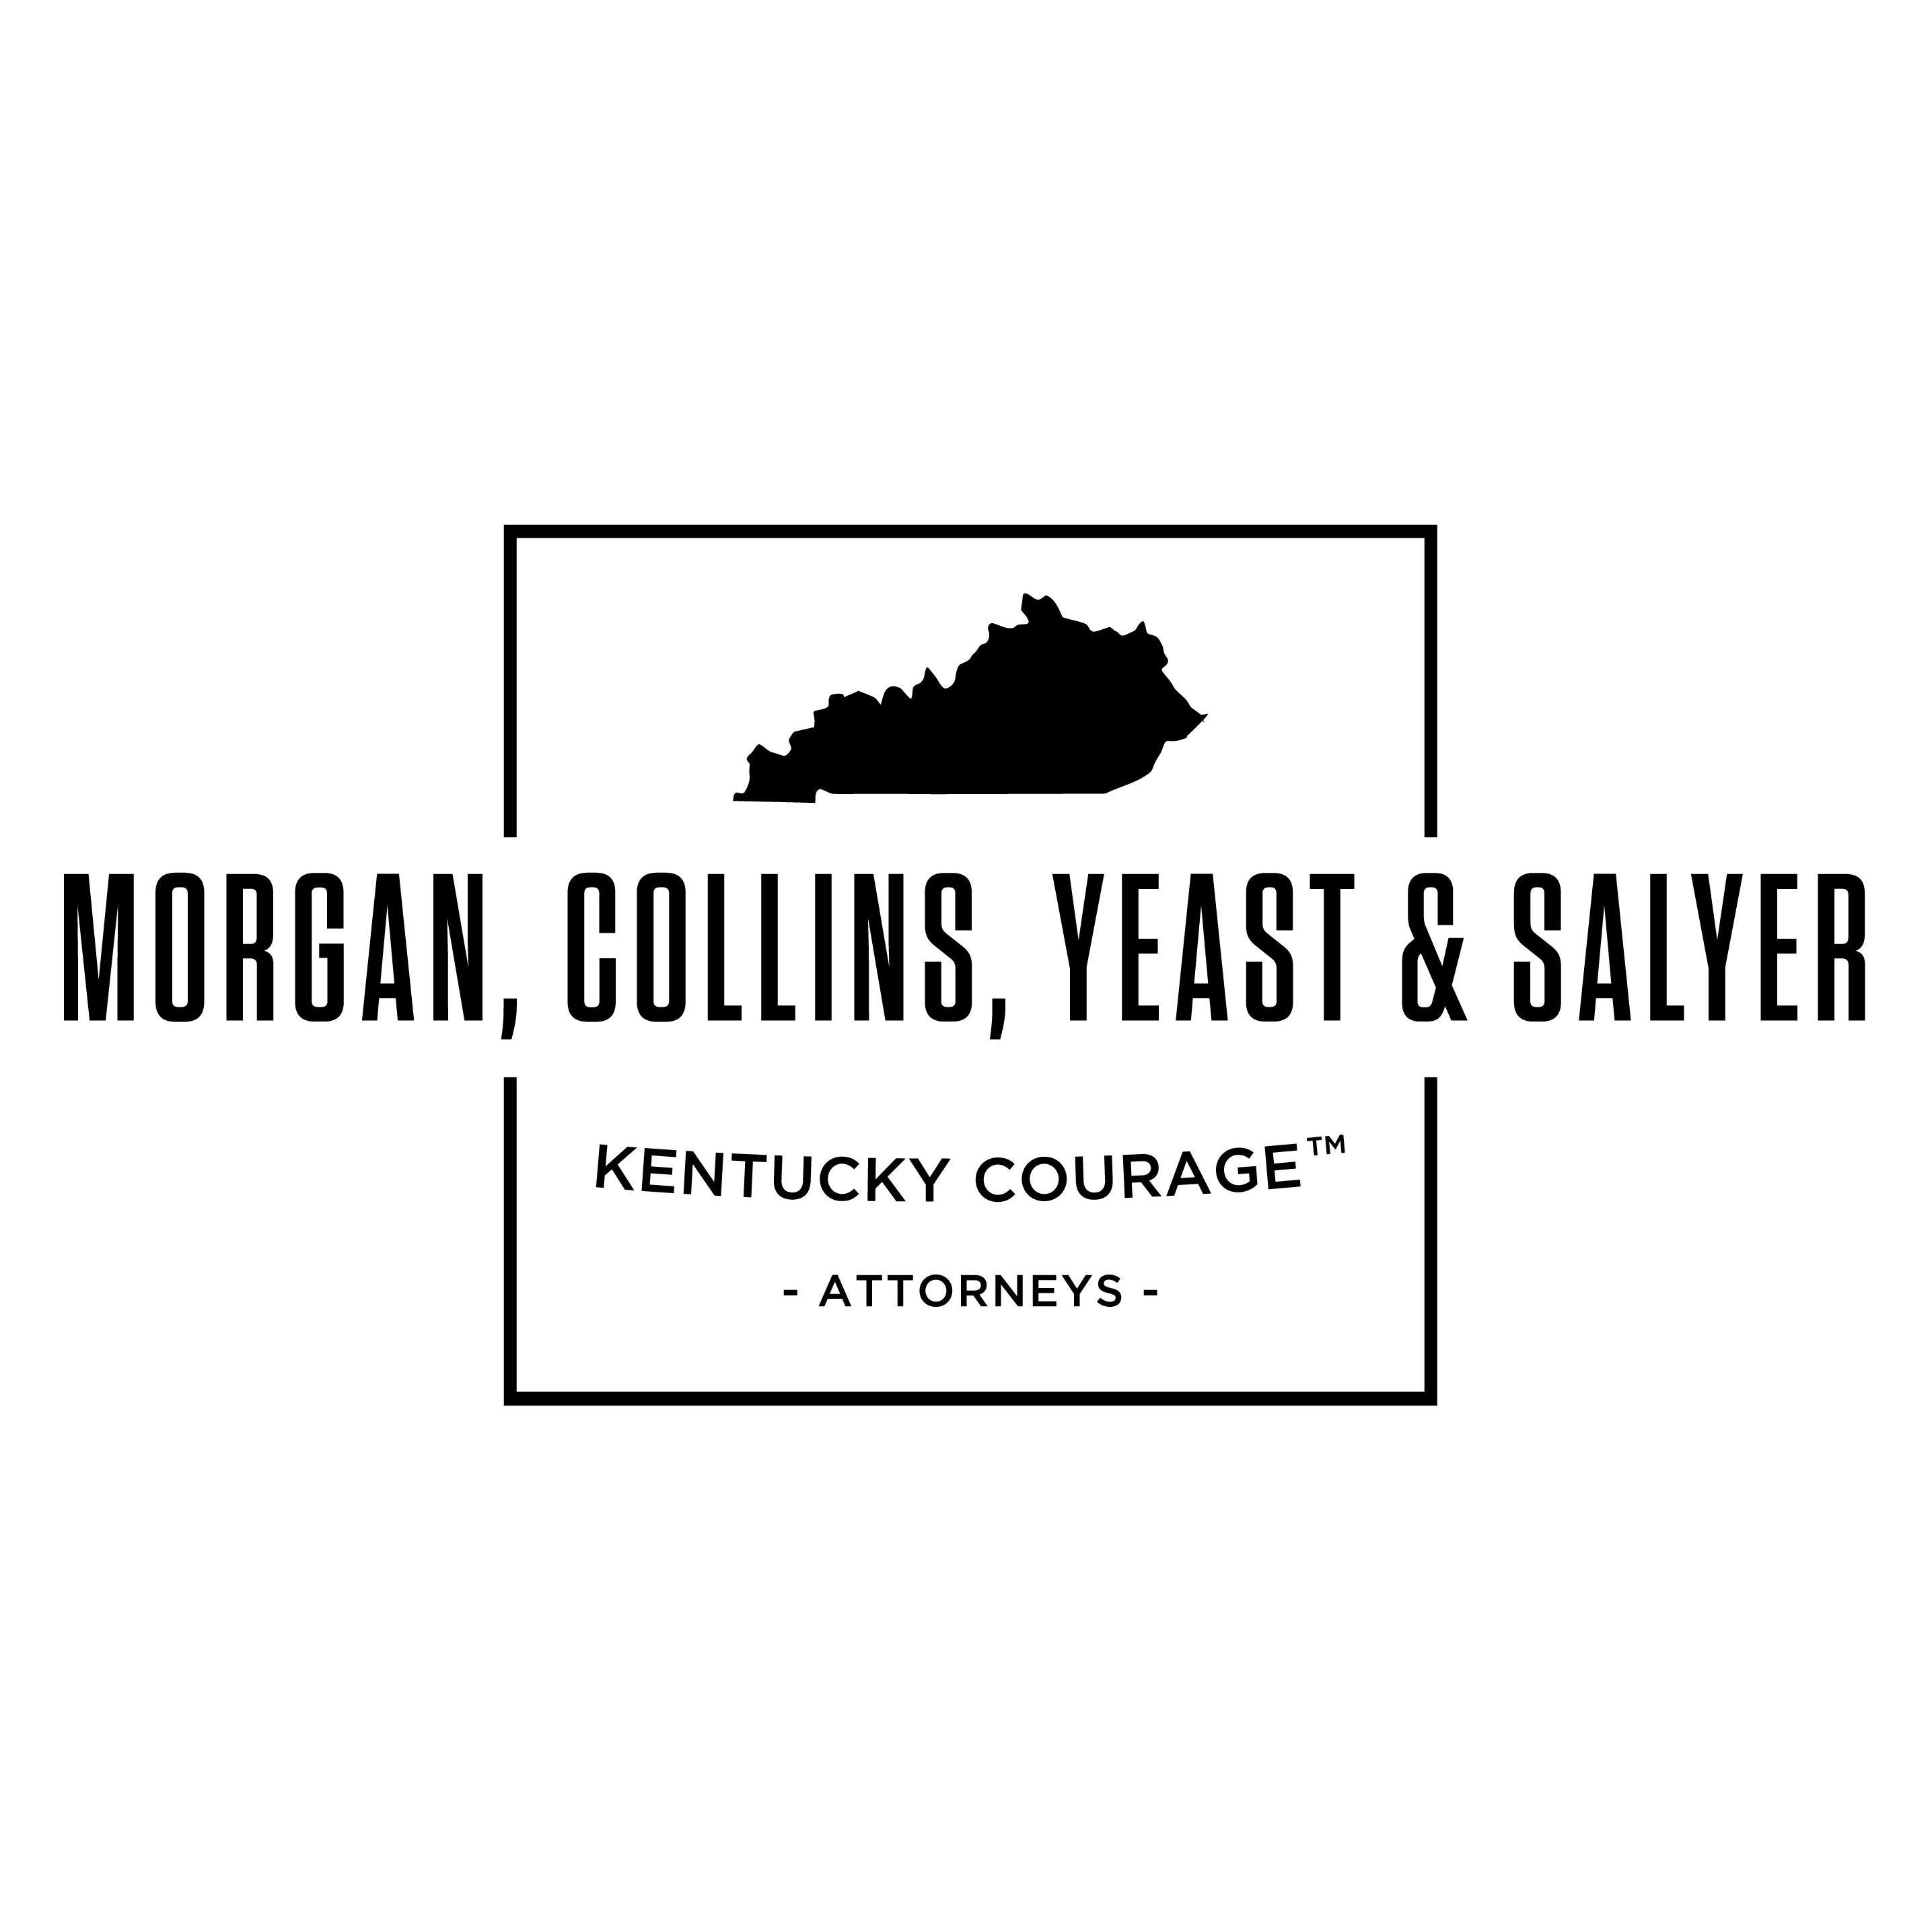 Morgan, Collins, Yeast & Salyer, PLLC